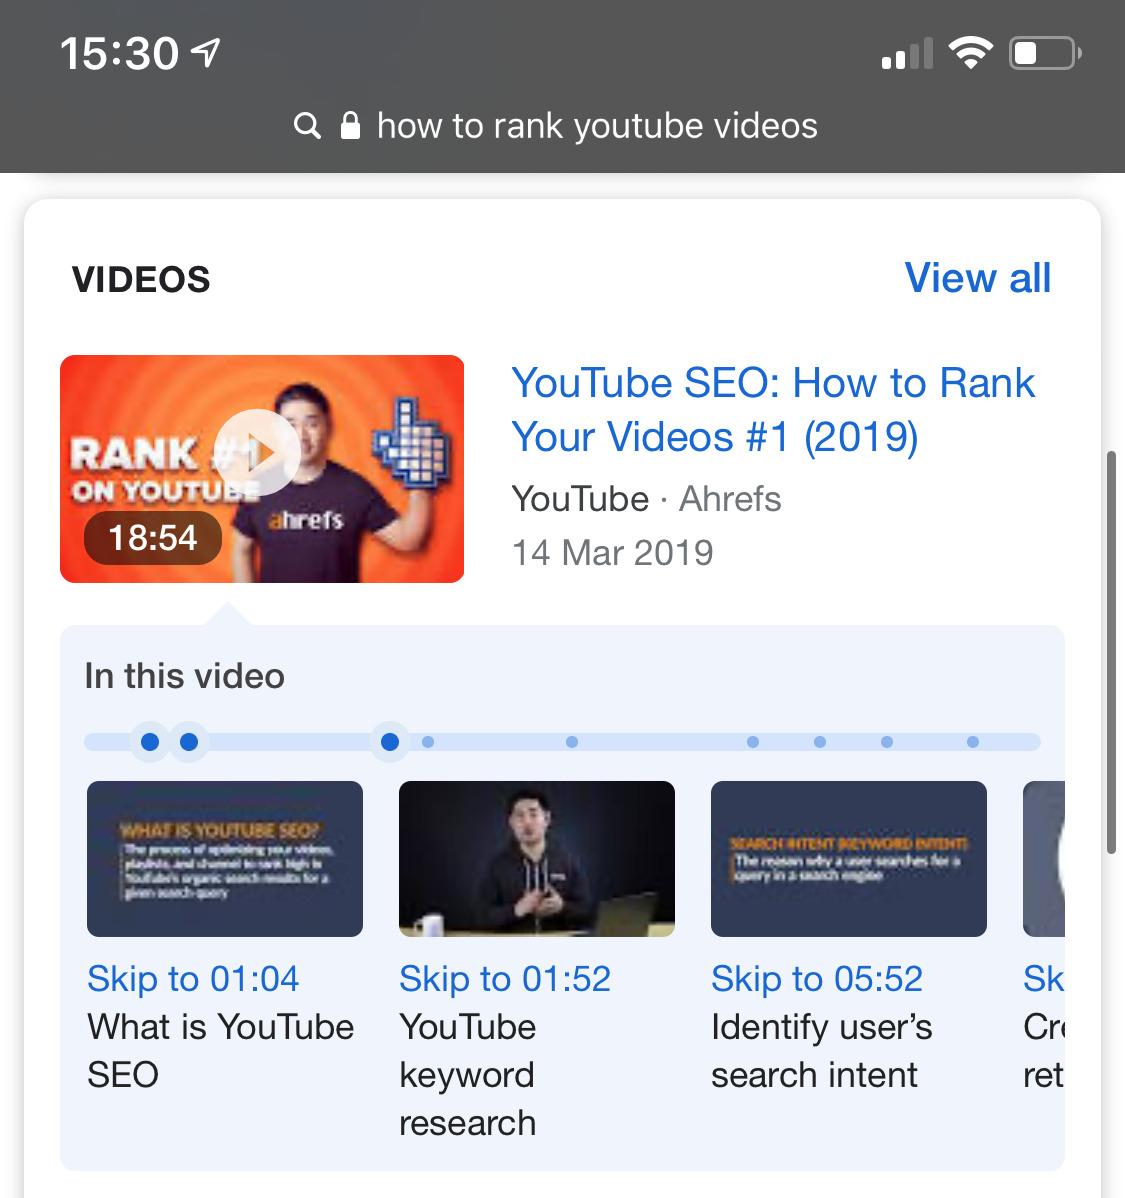 "comment classer les horodatages des vidéos youtube 1 ""srcset ="" https://ahrefs.com/blog/wp-content/uploads/2019/12/how-to-rank-youtube-videos-timestamps-1.jpg 1125w, https : //ahrefs.com/blog/wp-content/uploads/2019/12/how-to-rank-youtube-videos-timestamps-1-399x425.jpg 399w, https://ahrefs.com/blog/wp- content /uploads/2019/12/how-to-rank-youtube-videos-timestamps-1-768x818.jpg 768w ""tailles ="" (largeur max: 1125px) 100vw, 1125px"